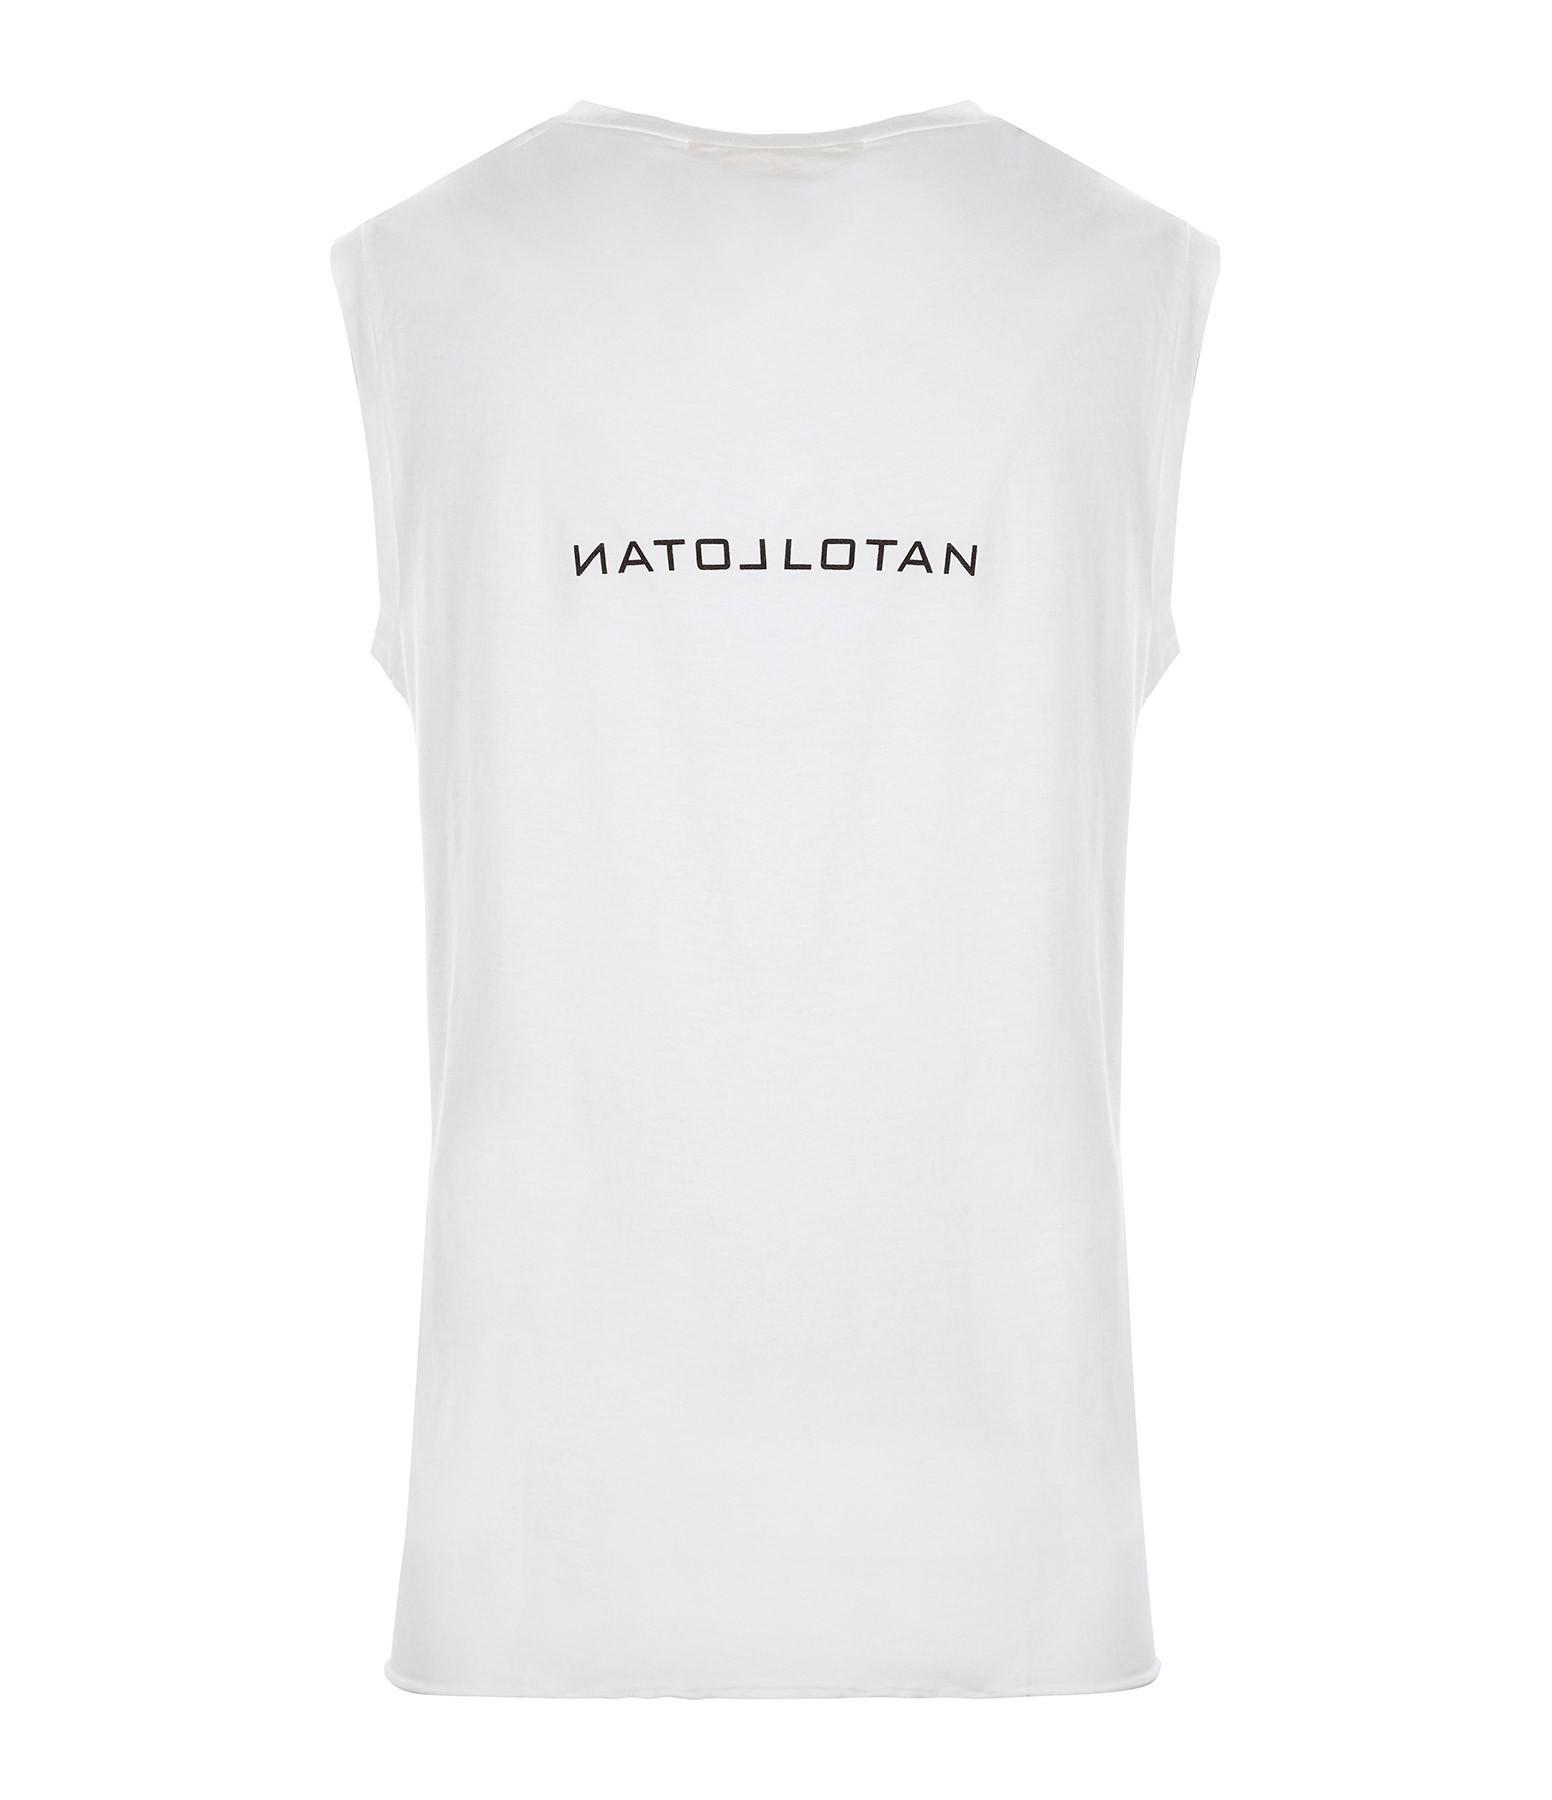 NILI LOTAN - Tee-shirt Love Hope Sex Coton Blanc